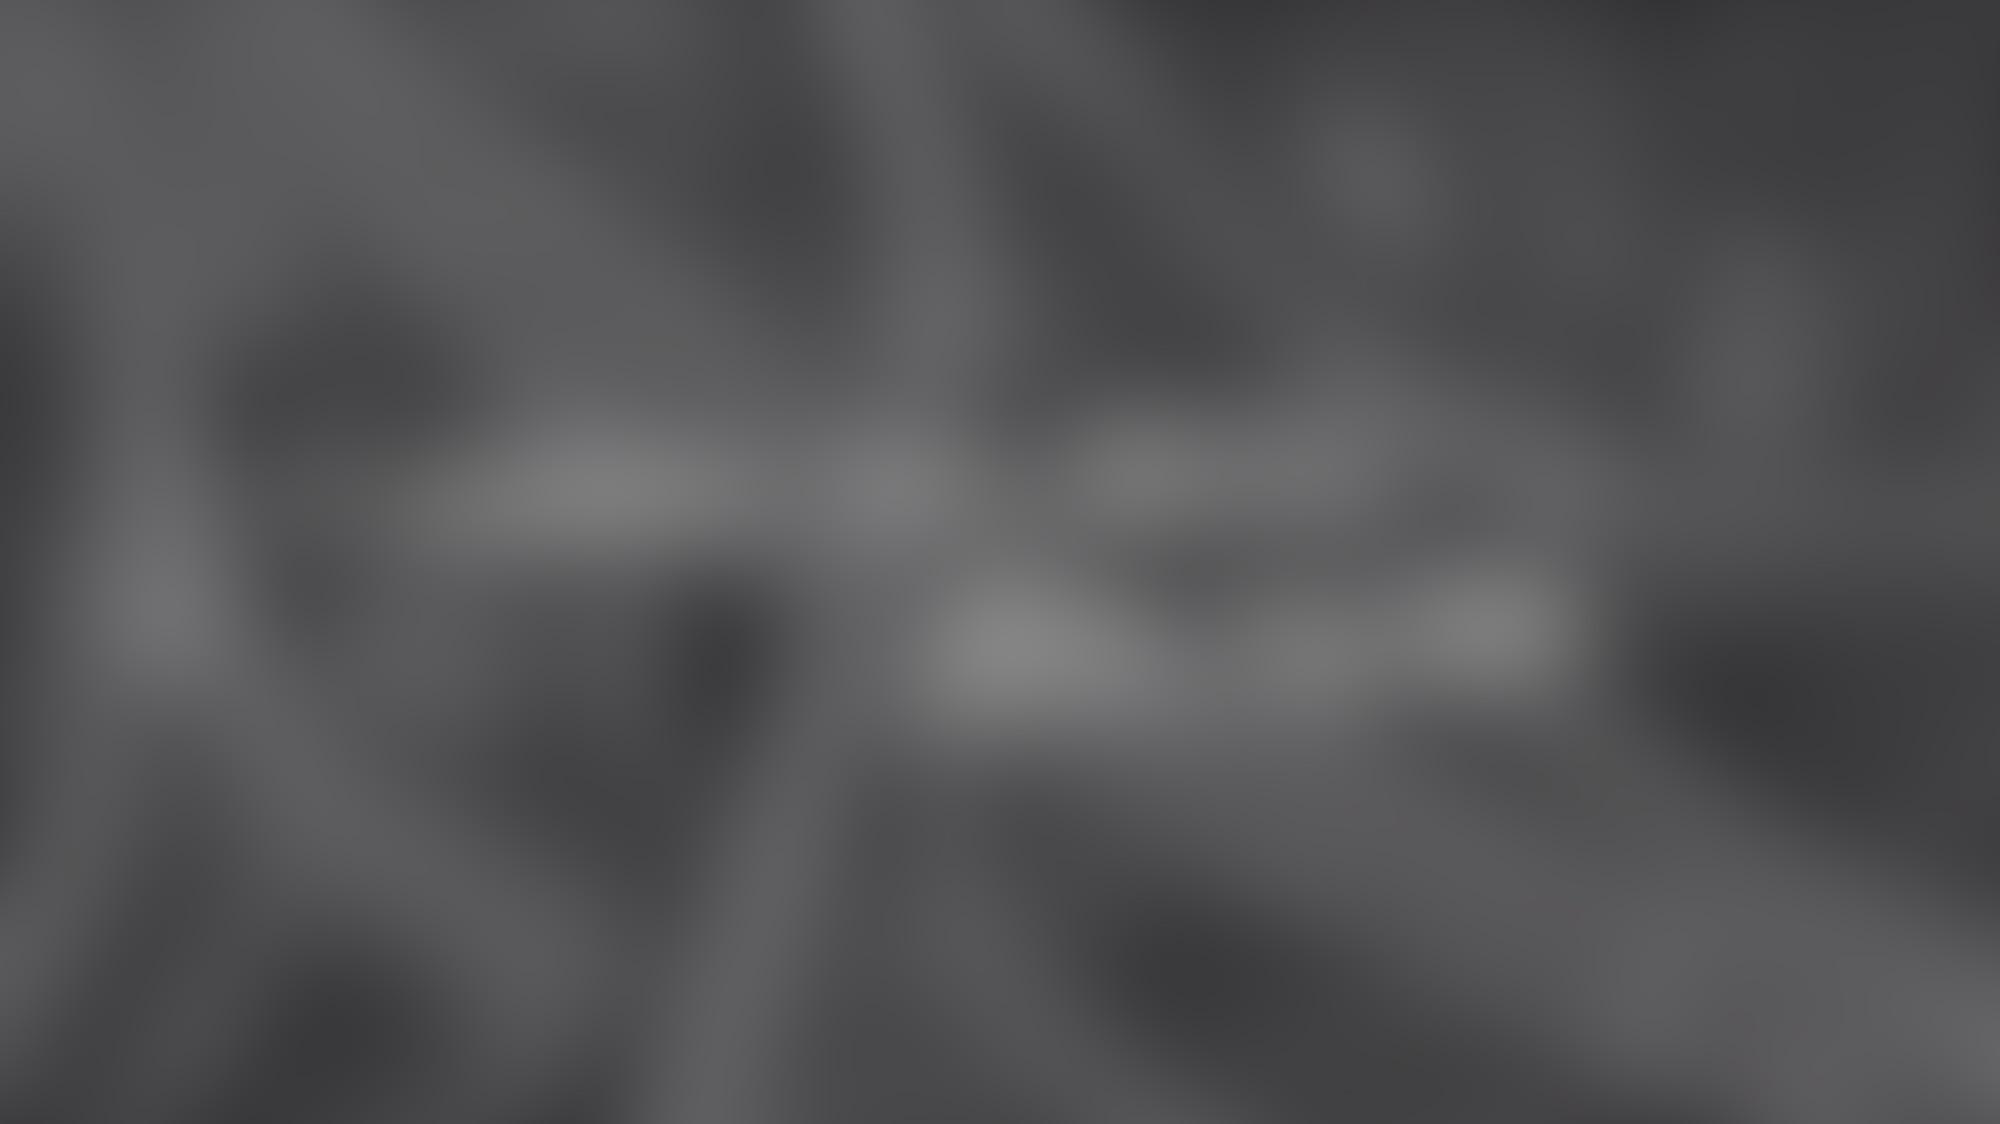 Jorja smith blue lights charlotte audrey lecture in progress 01 autocompressfitresizeixlibphp 1 1 0max h2000max w3 D2000q80s026603645e32610015f42654cfc637eb